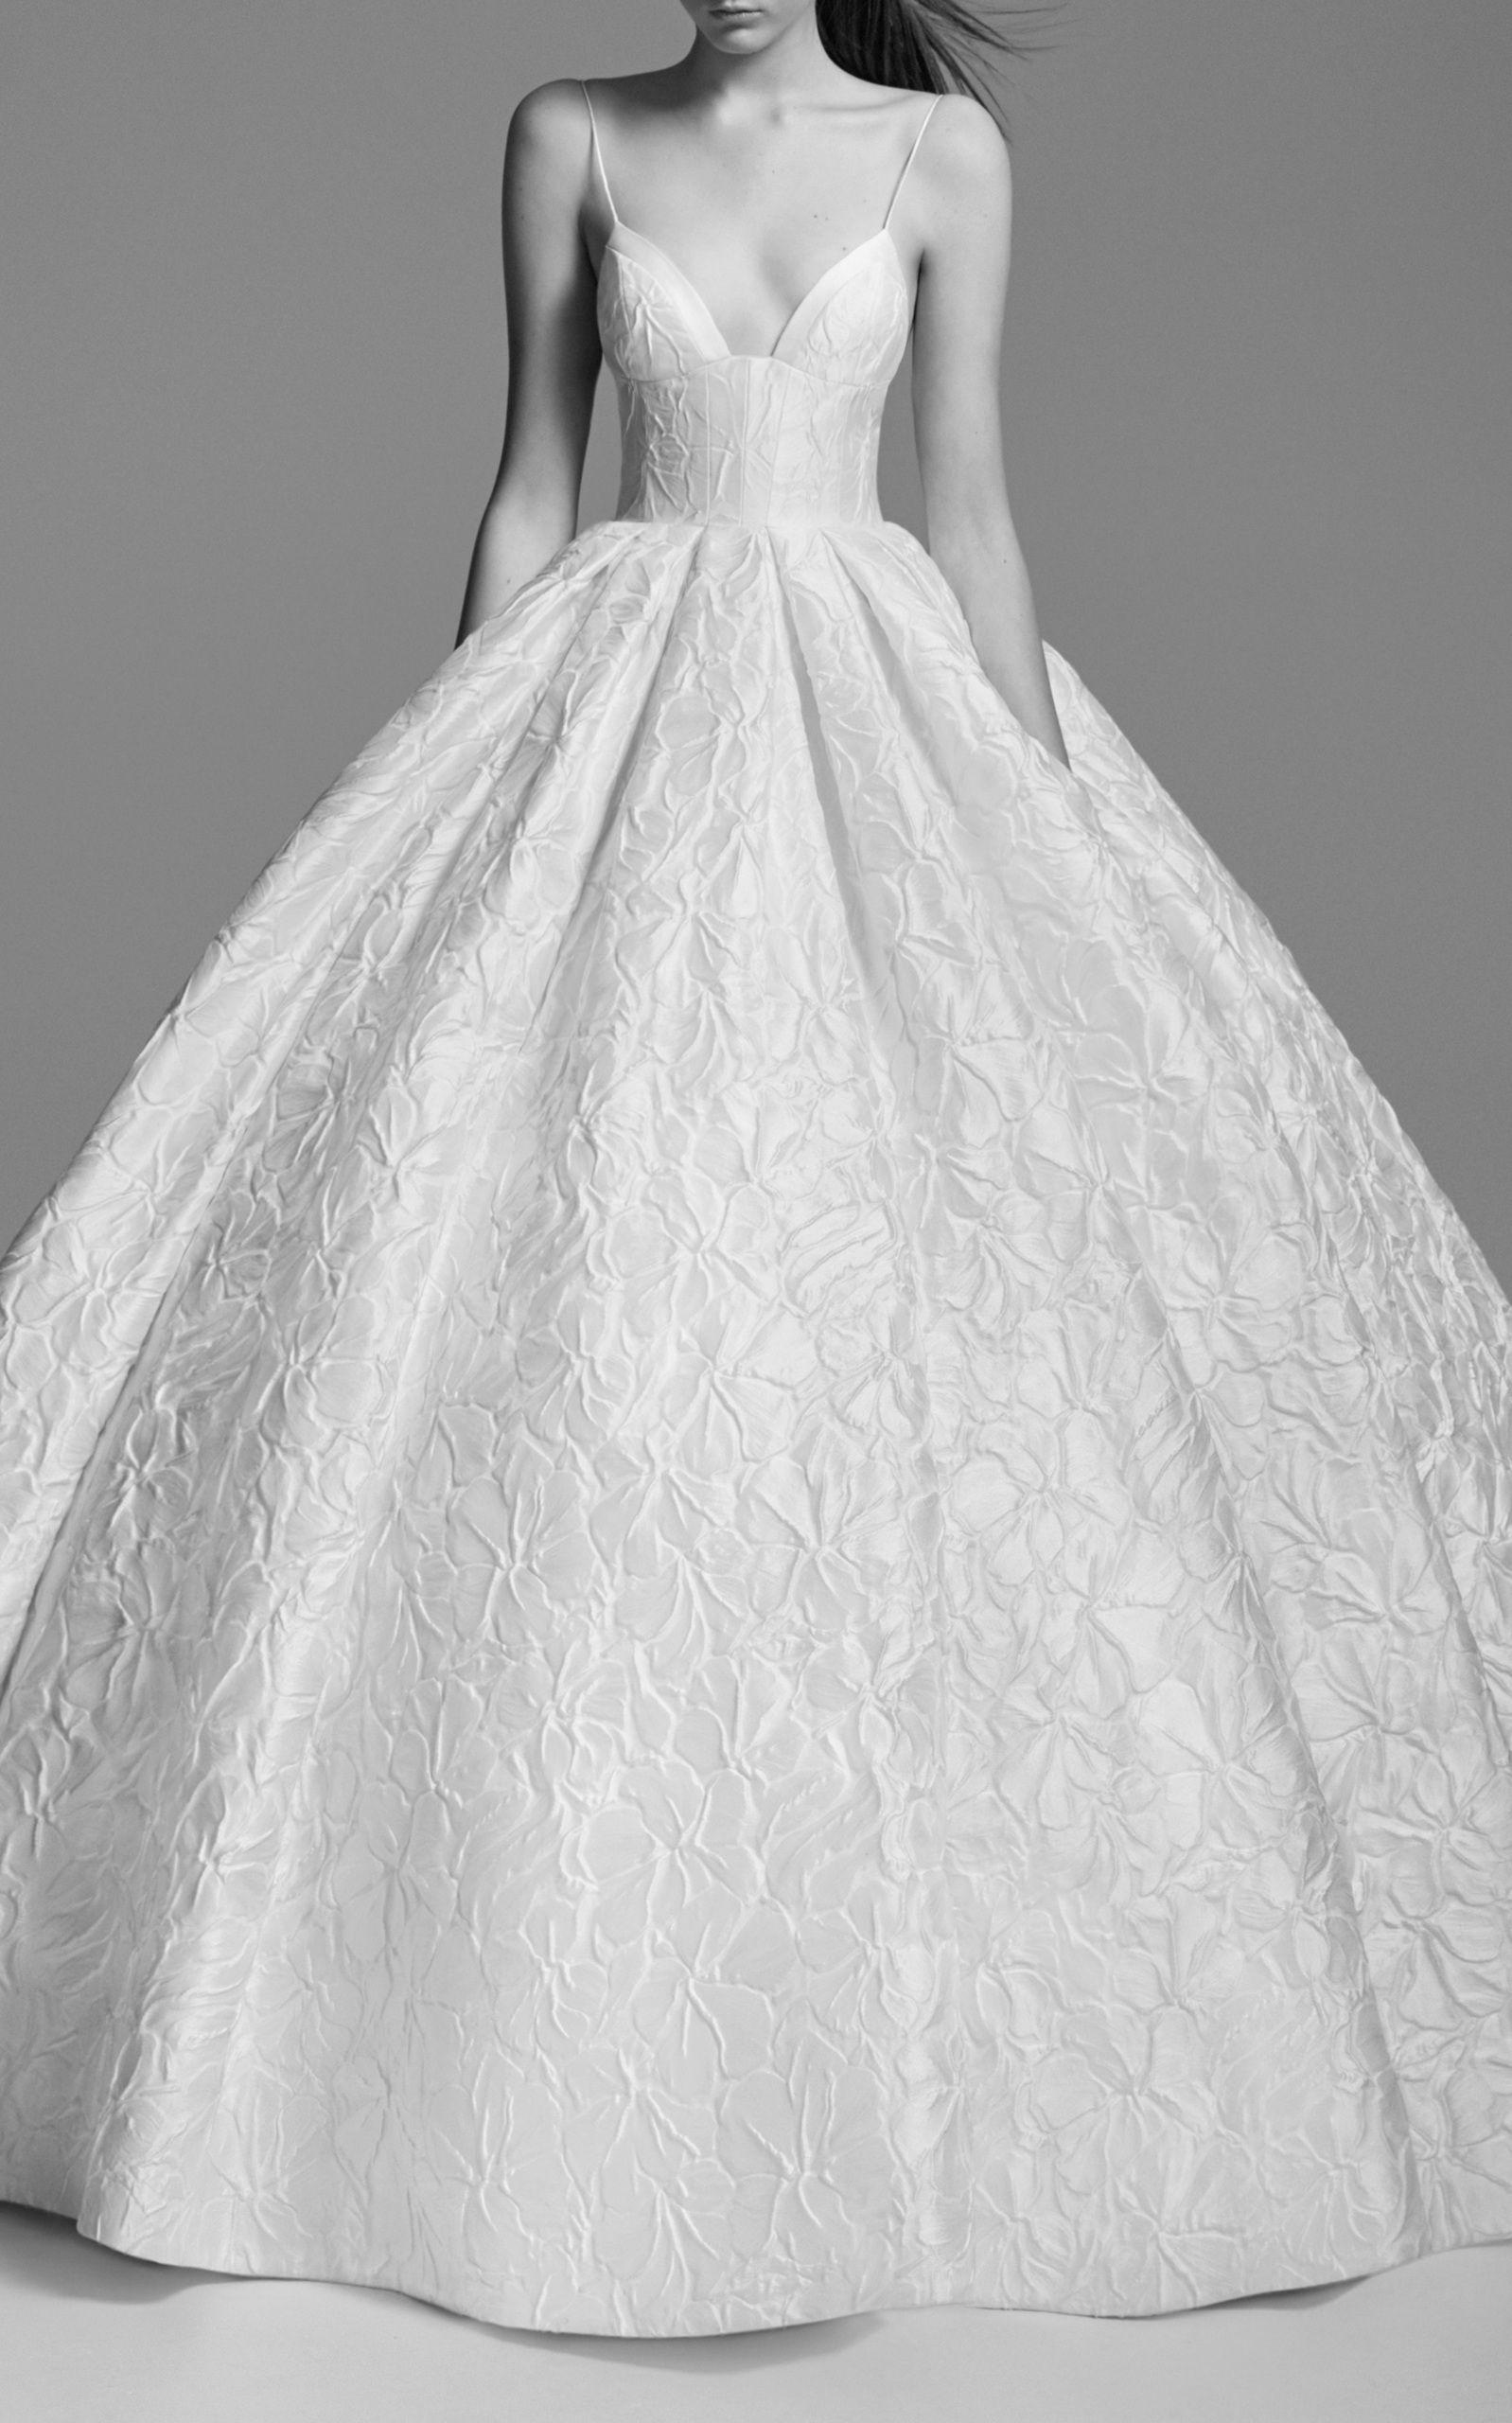 Alex Perry Bride Ashton Floral Brocade Gown at Moda Operandi ...